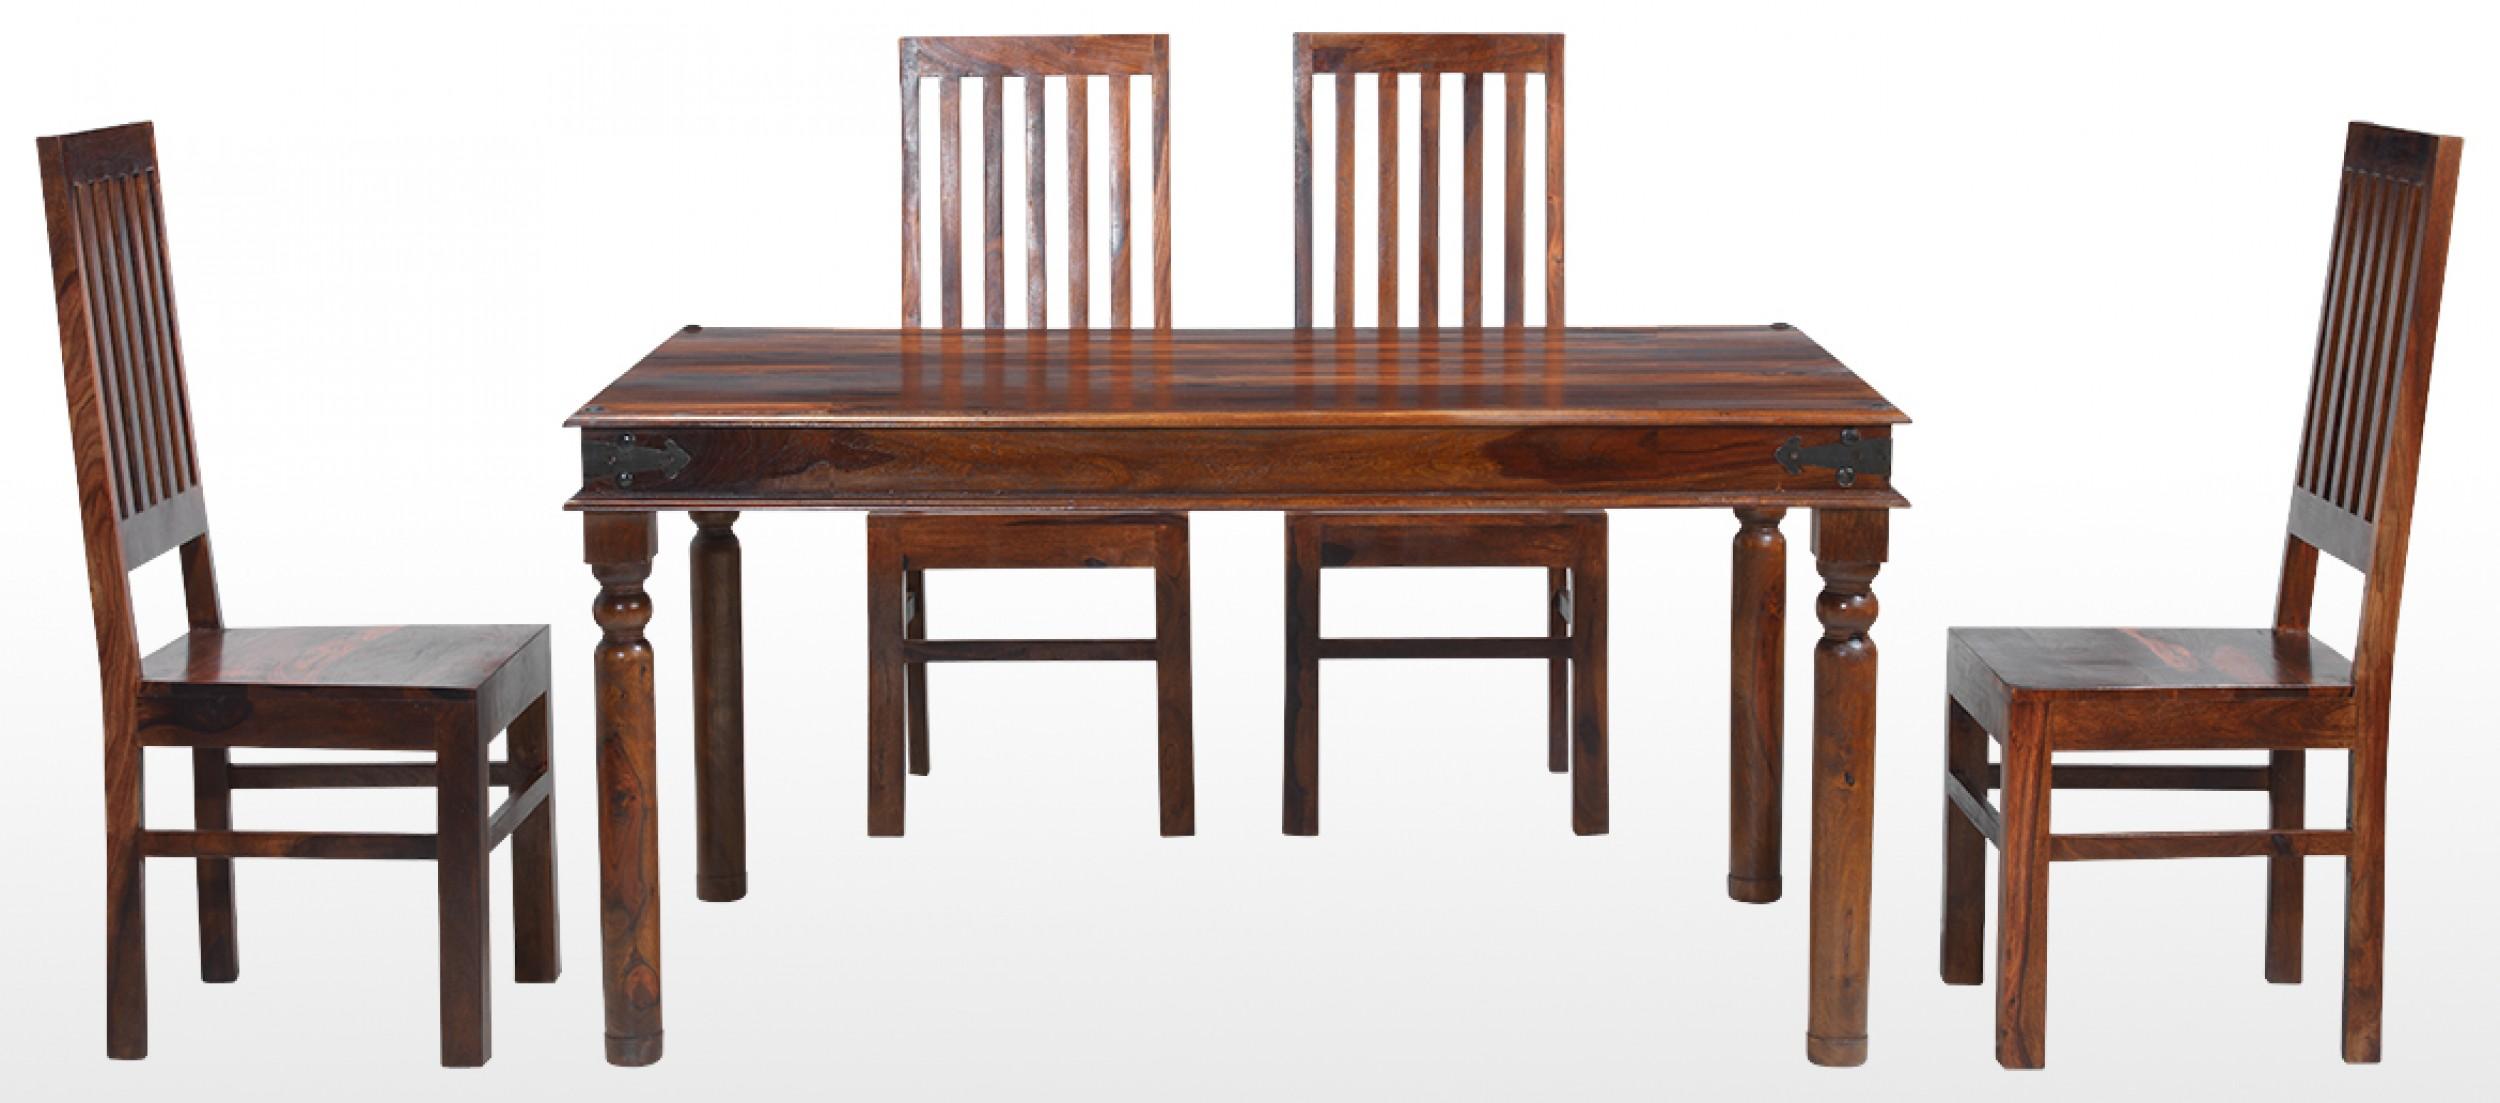 Jali Sheesham 140 cm Thakat Dining Table and 4 Chairs  : jali sheesham thakat dining table sh 12 set 4 front from www.quercusliving.co.uk size 2500 x 1103 jpeg 279kB